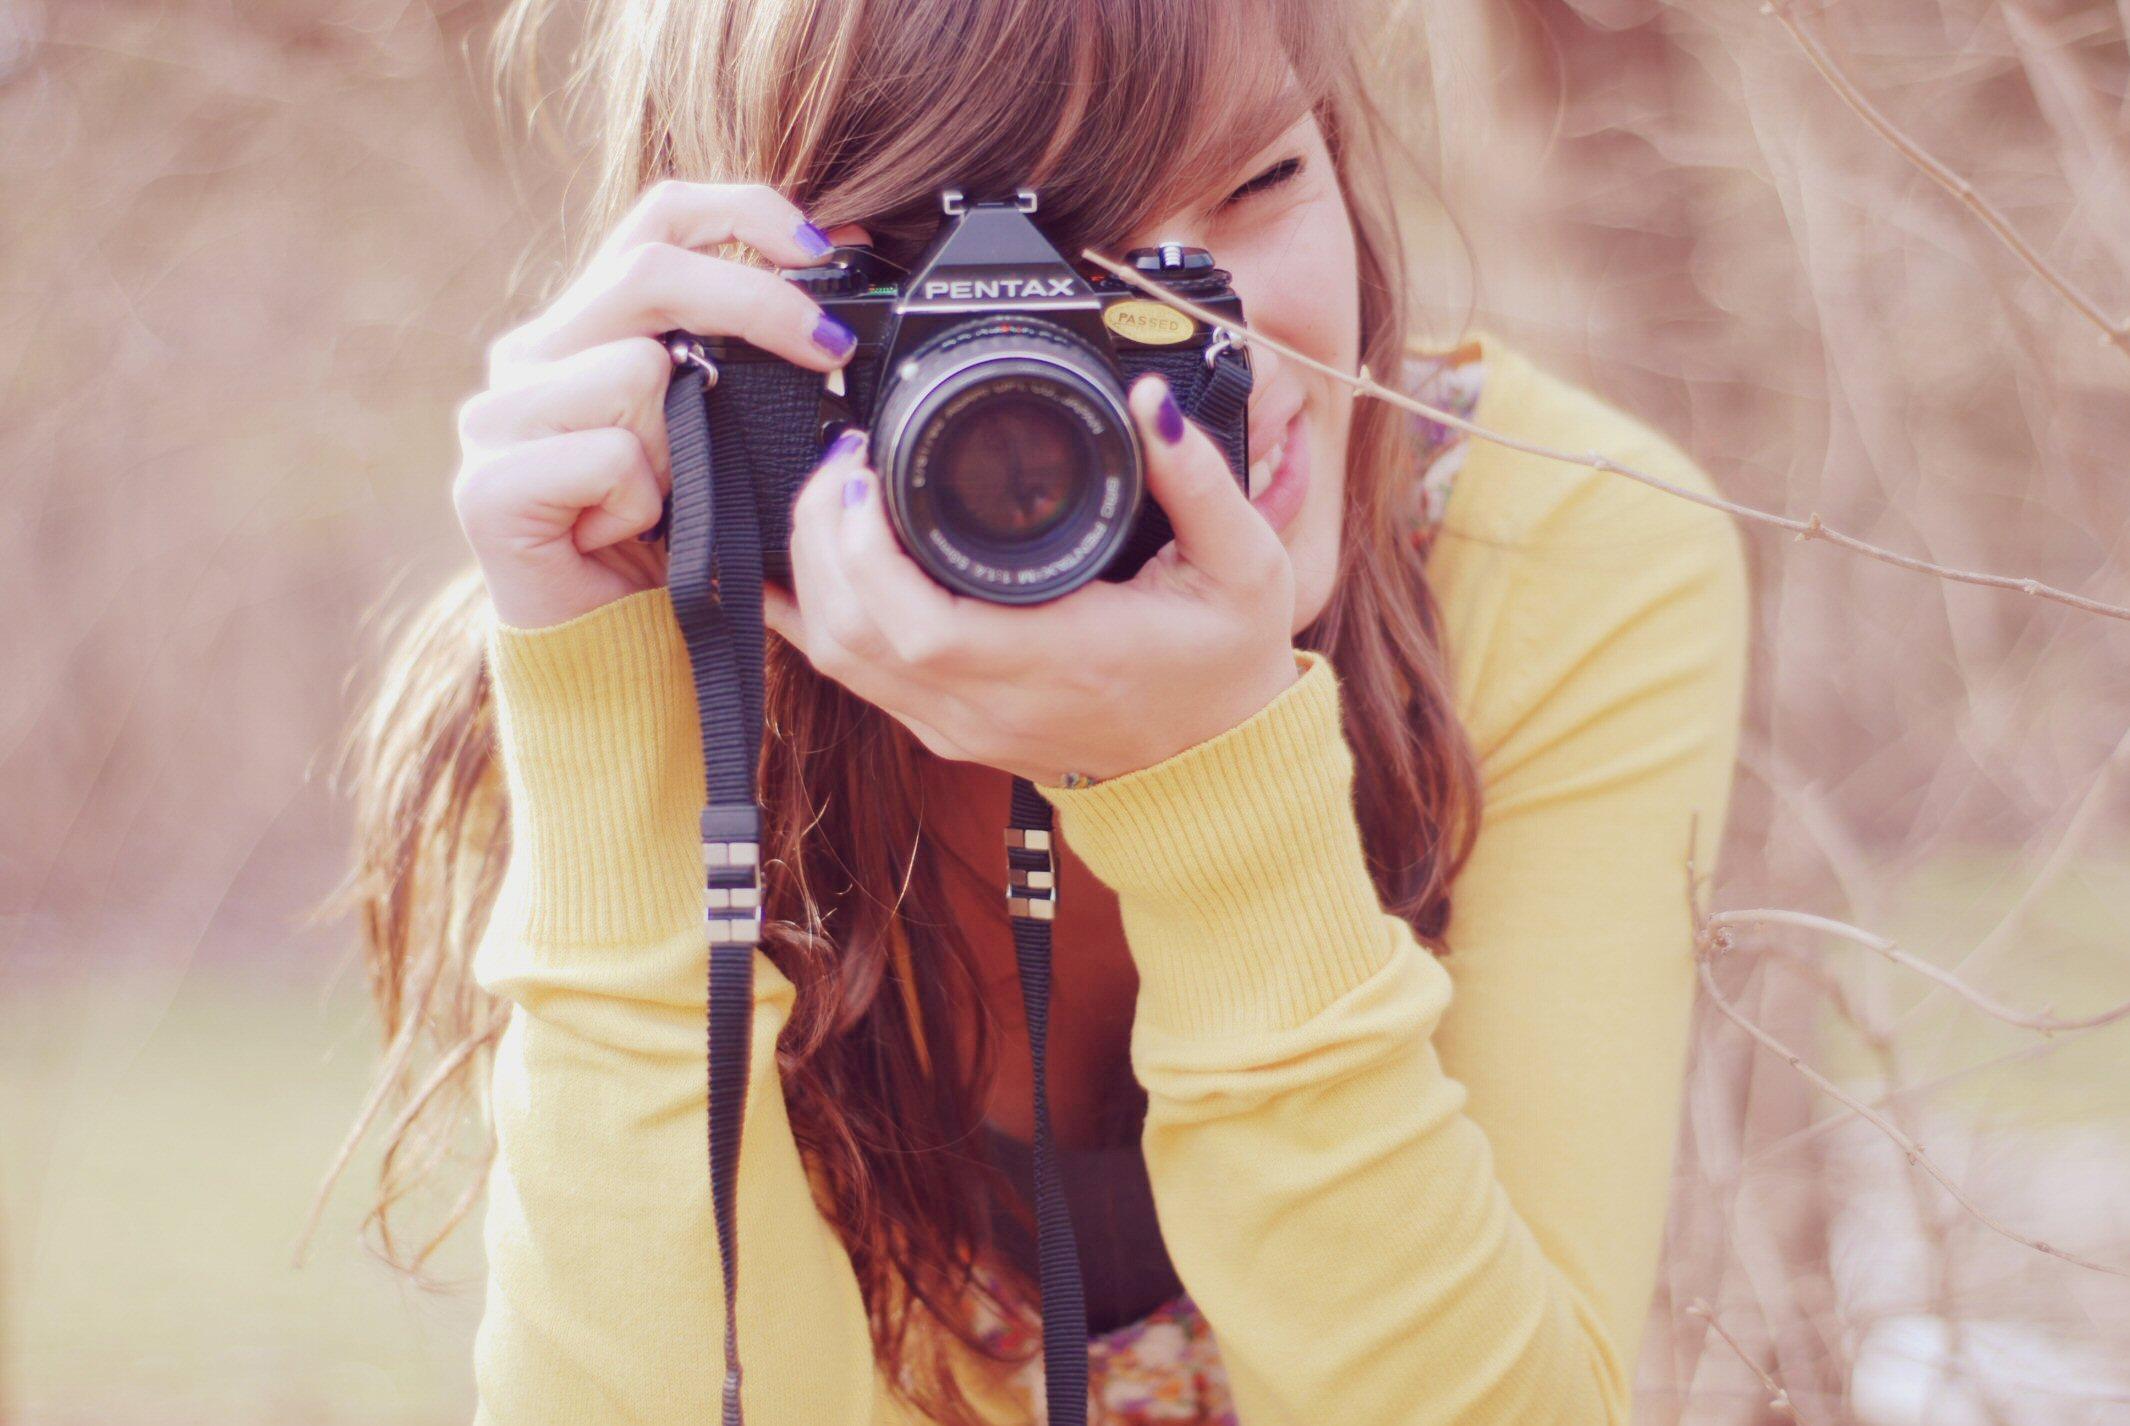 Картинки с девушками с фотоаппаратом